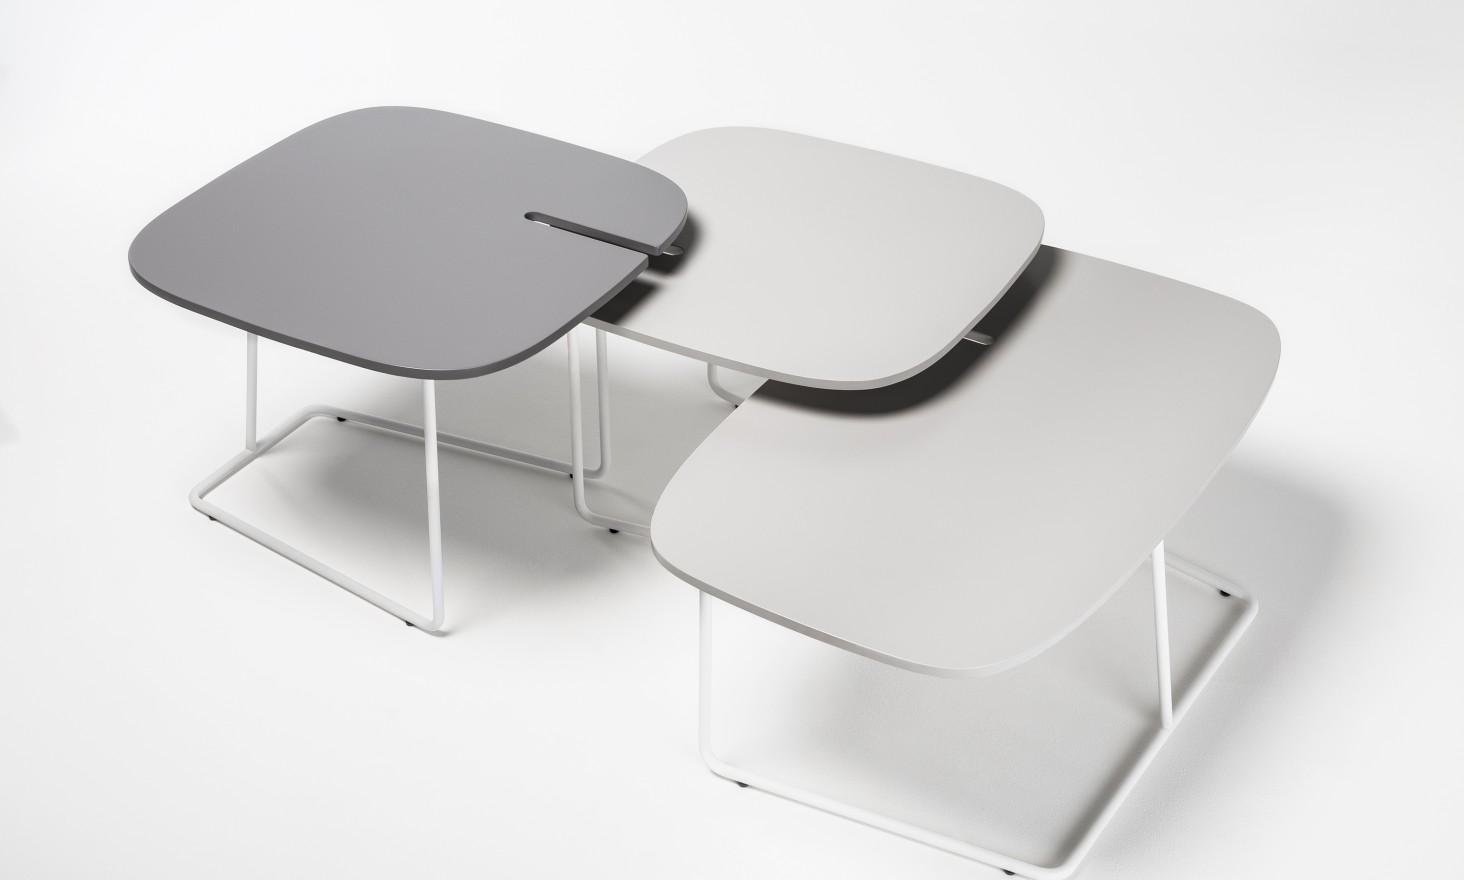 TEDDY_BEAR_packshot_tables 1